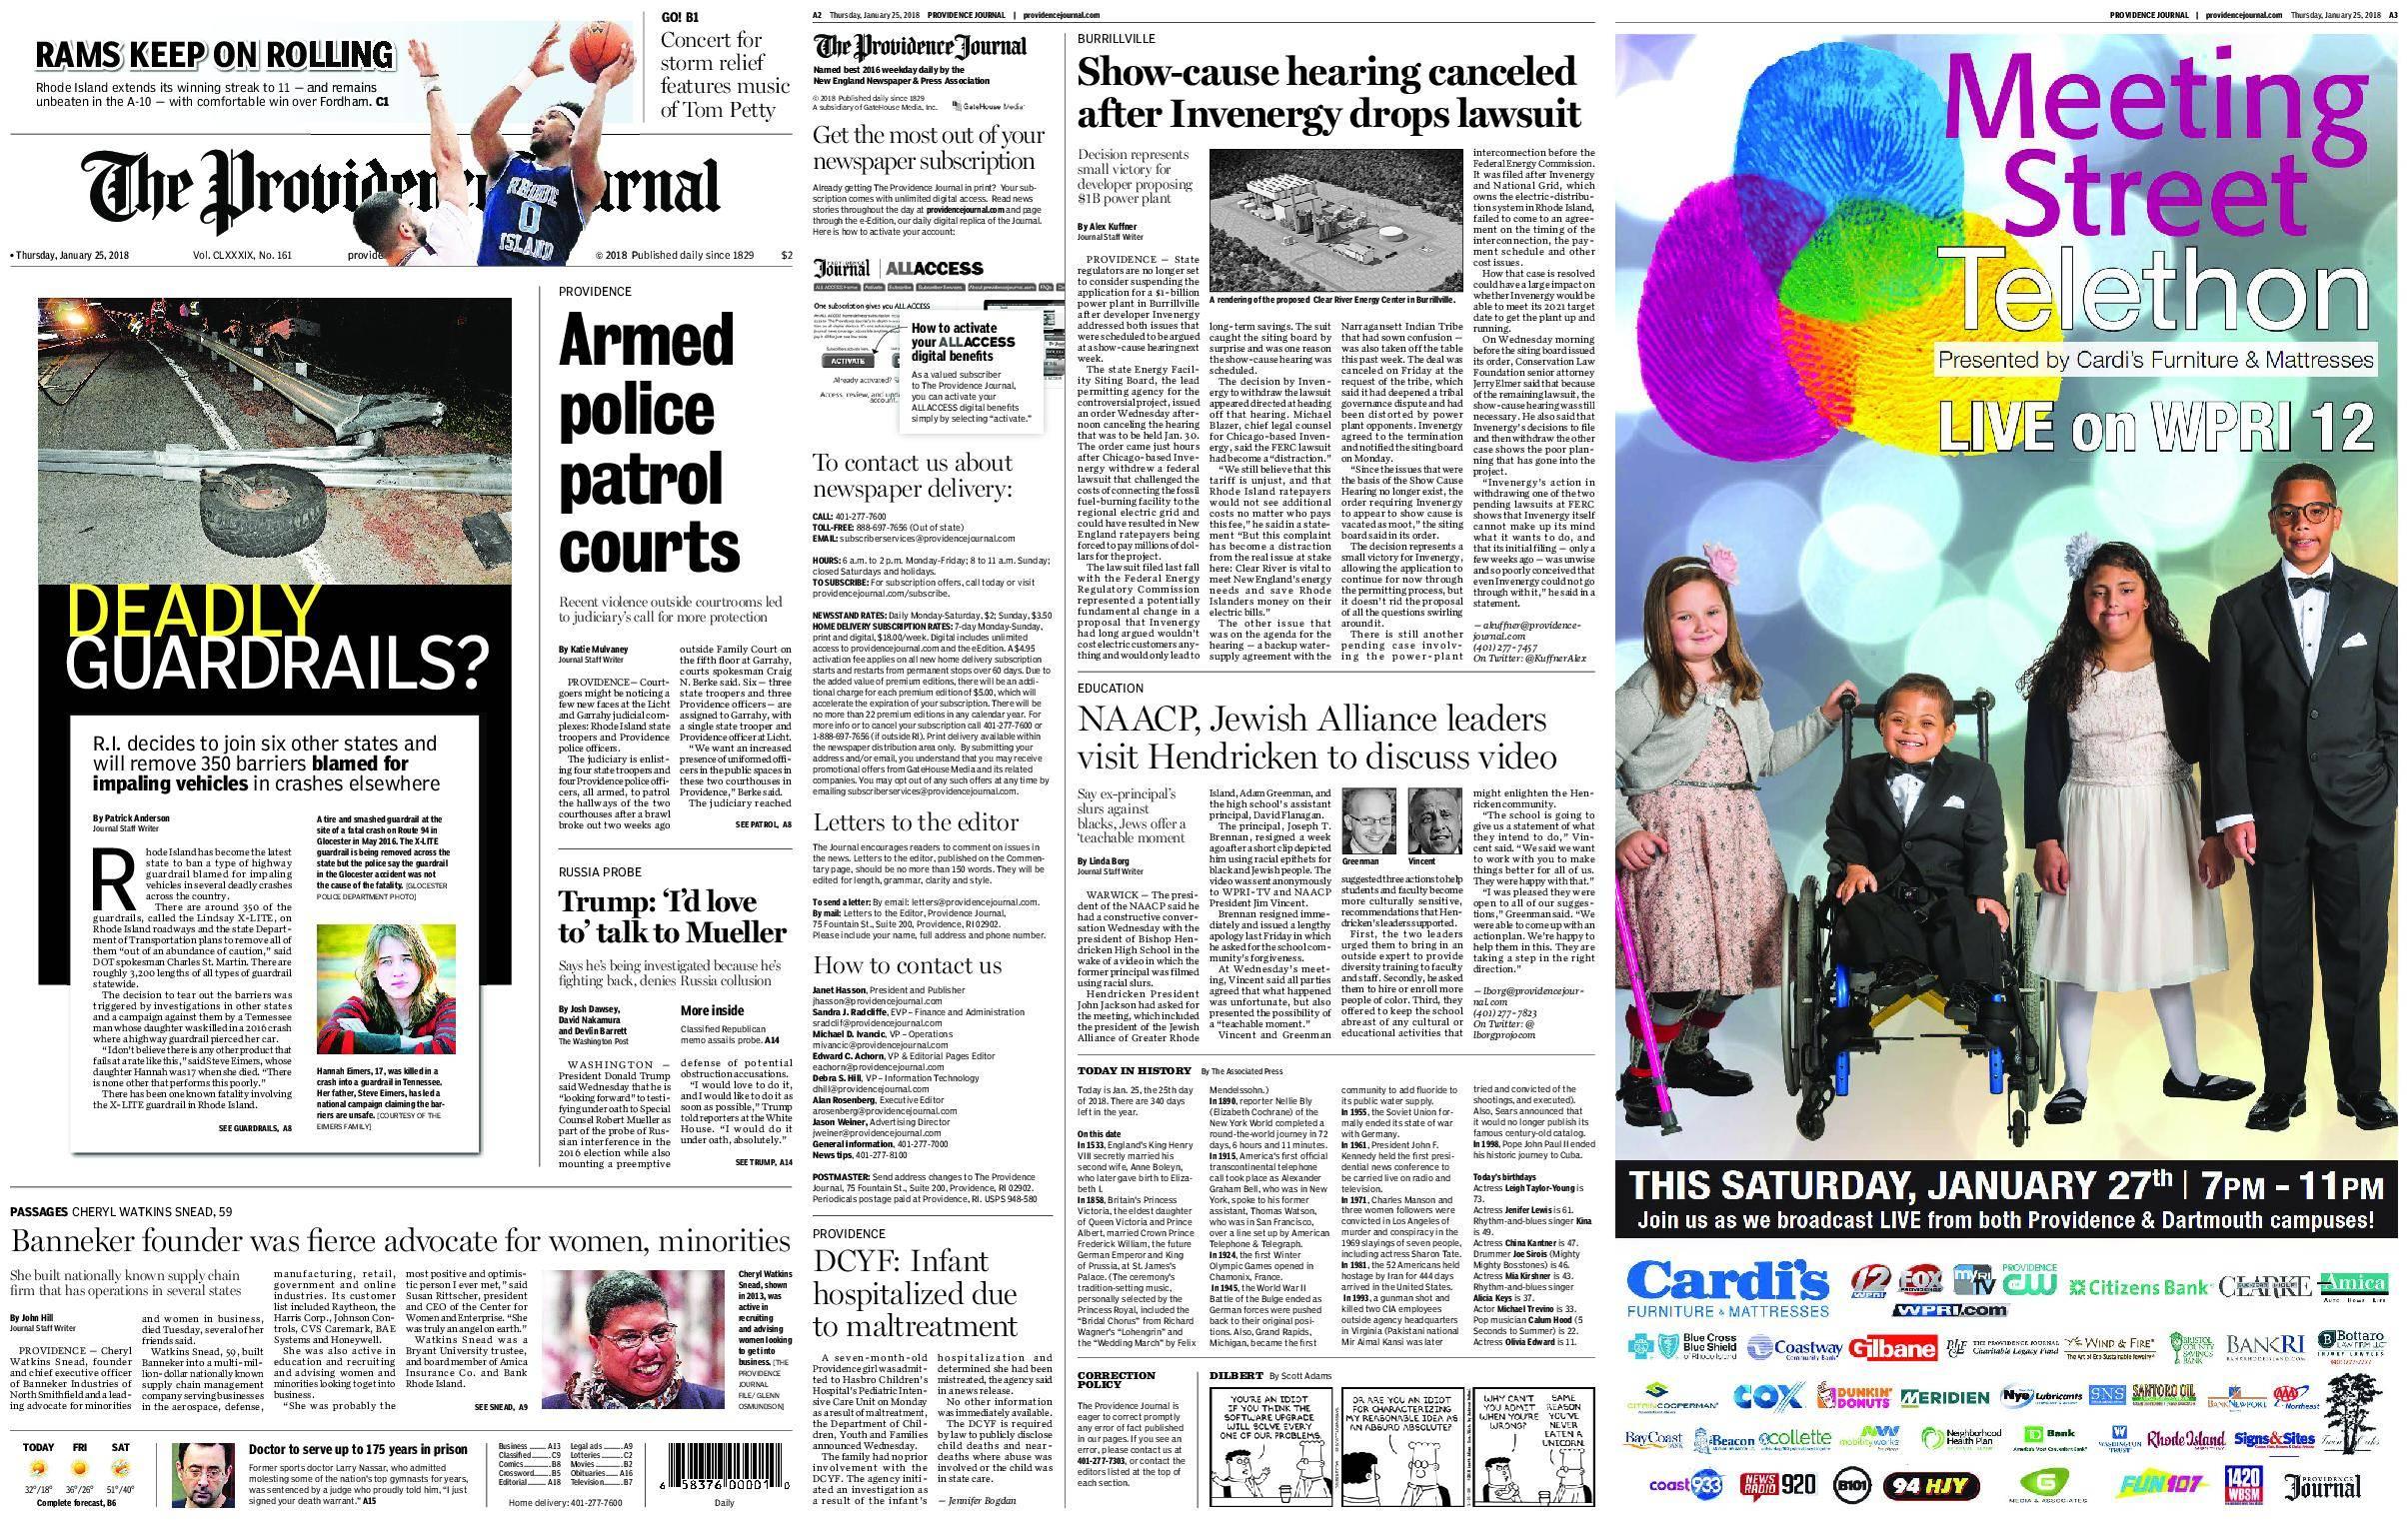 The Providence Journal – January 25, 2018 / AvaxHome